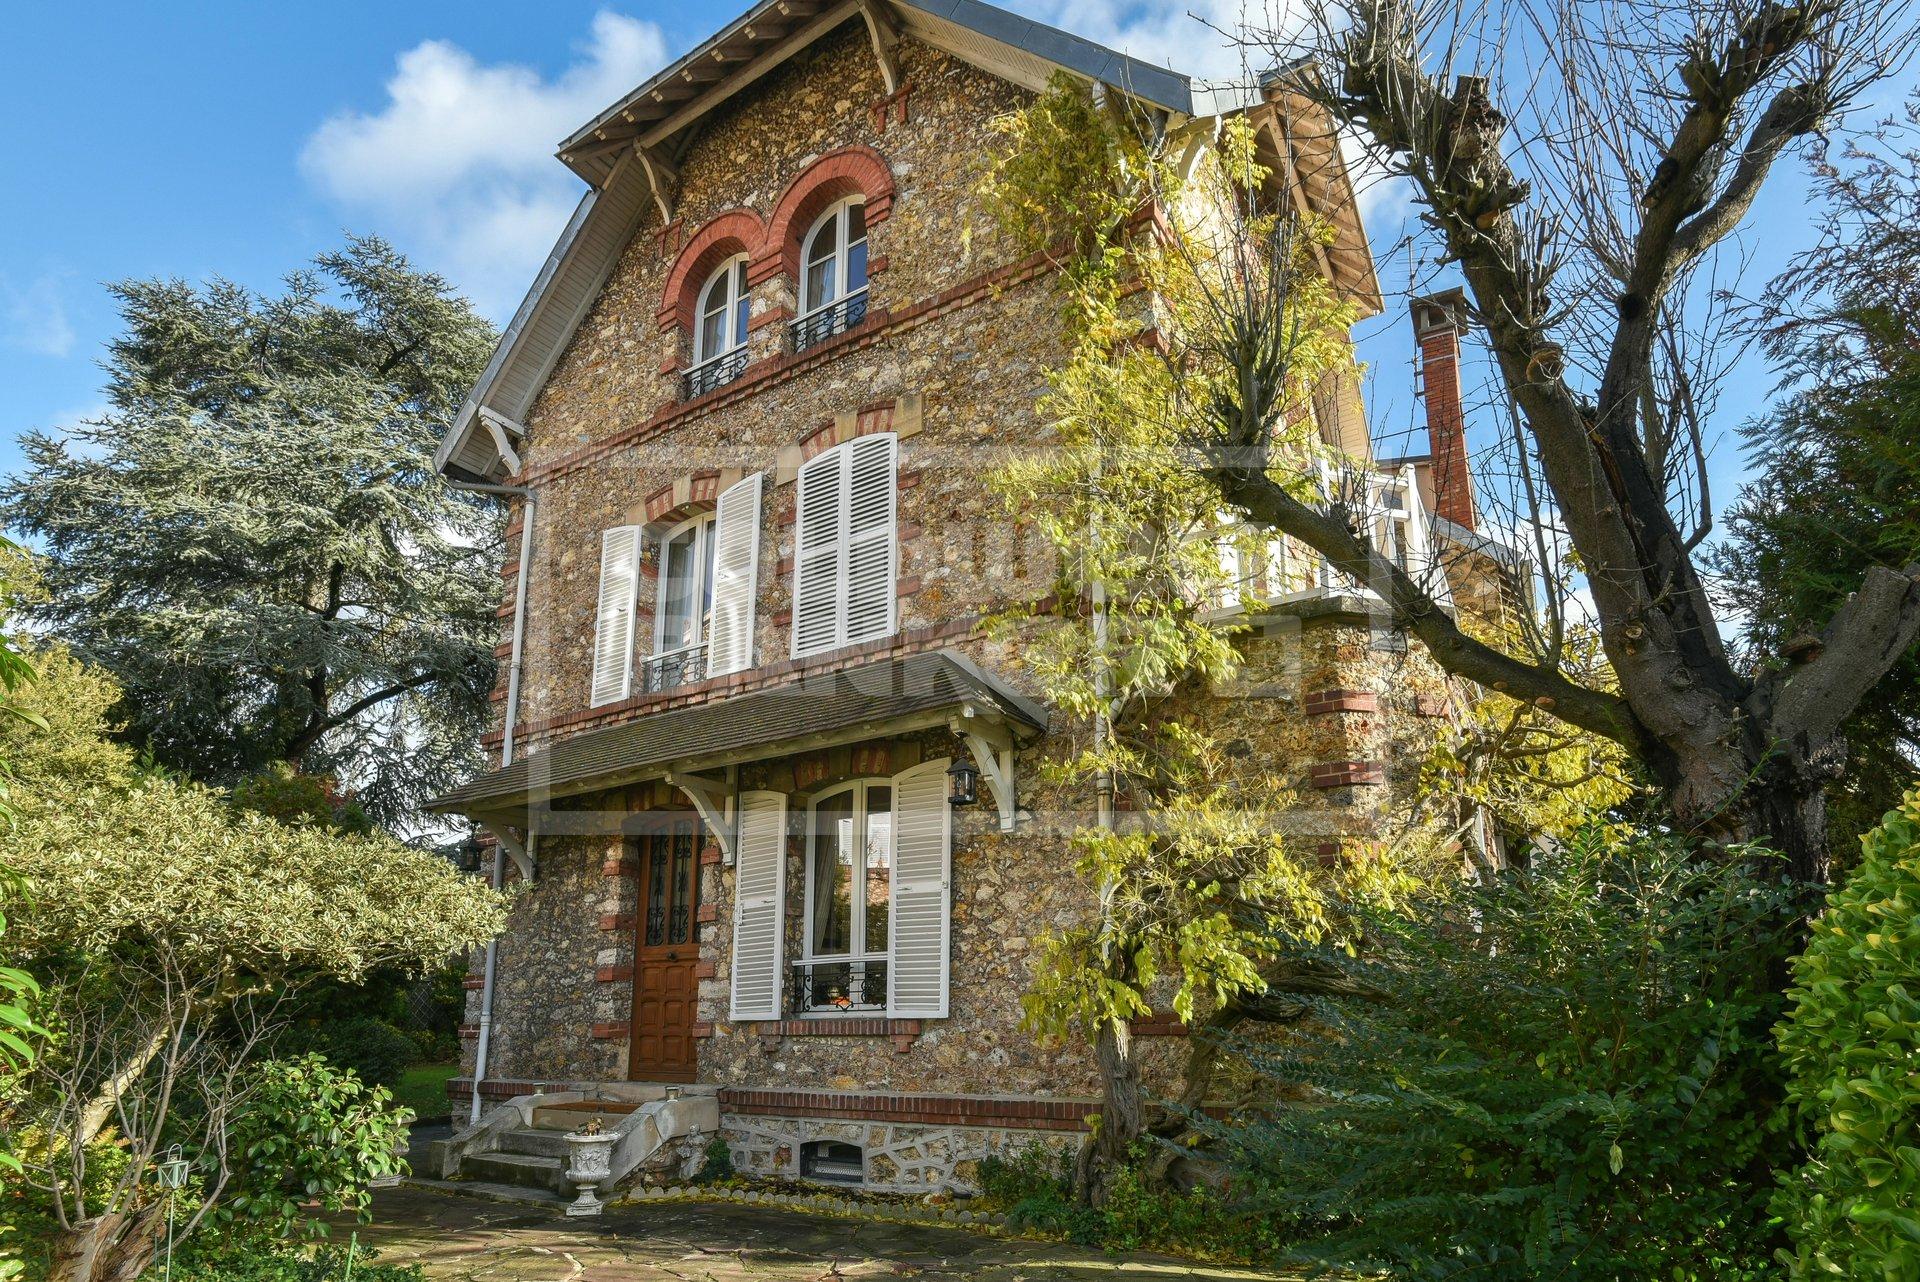 Vente Maison - Saint-Germain-en-Laye